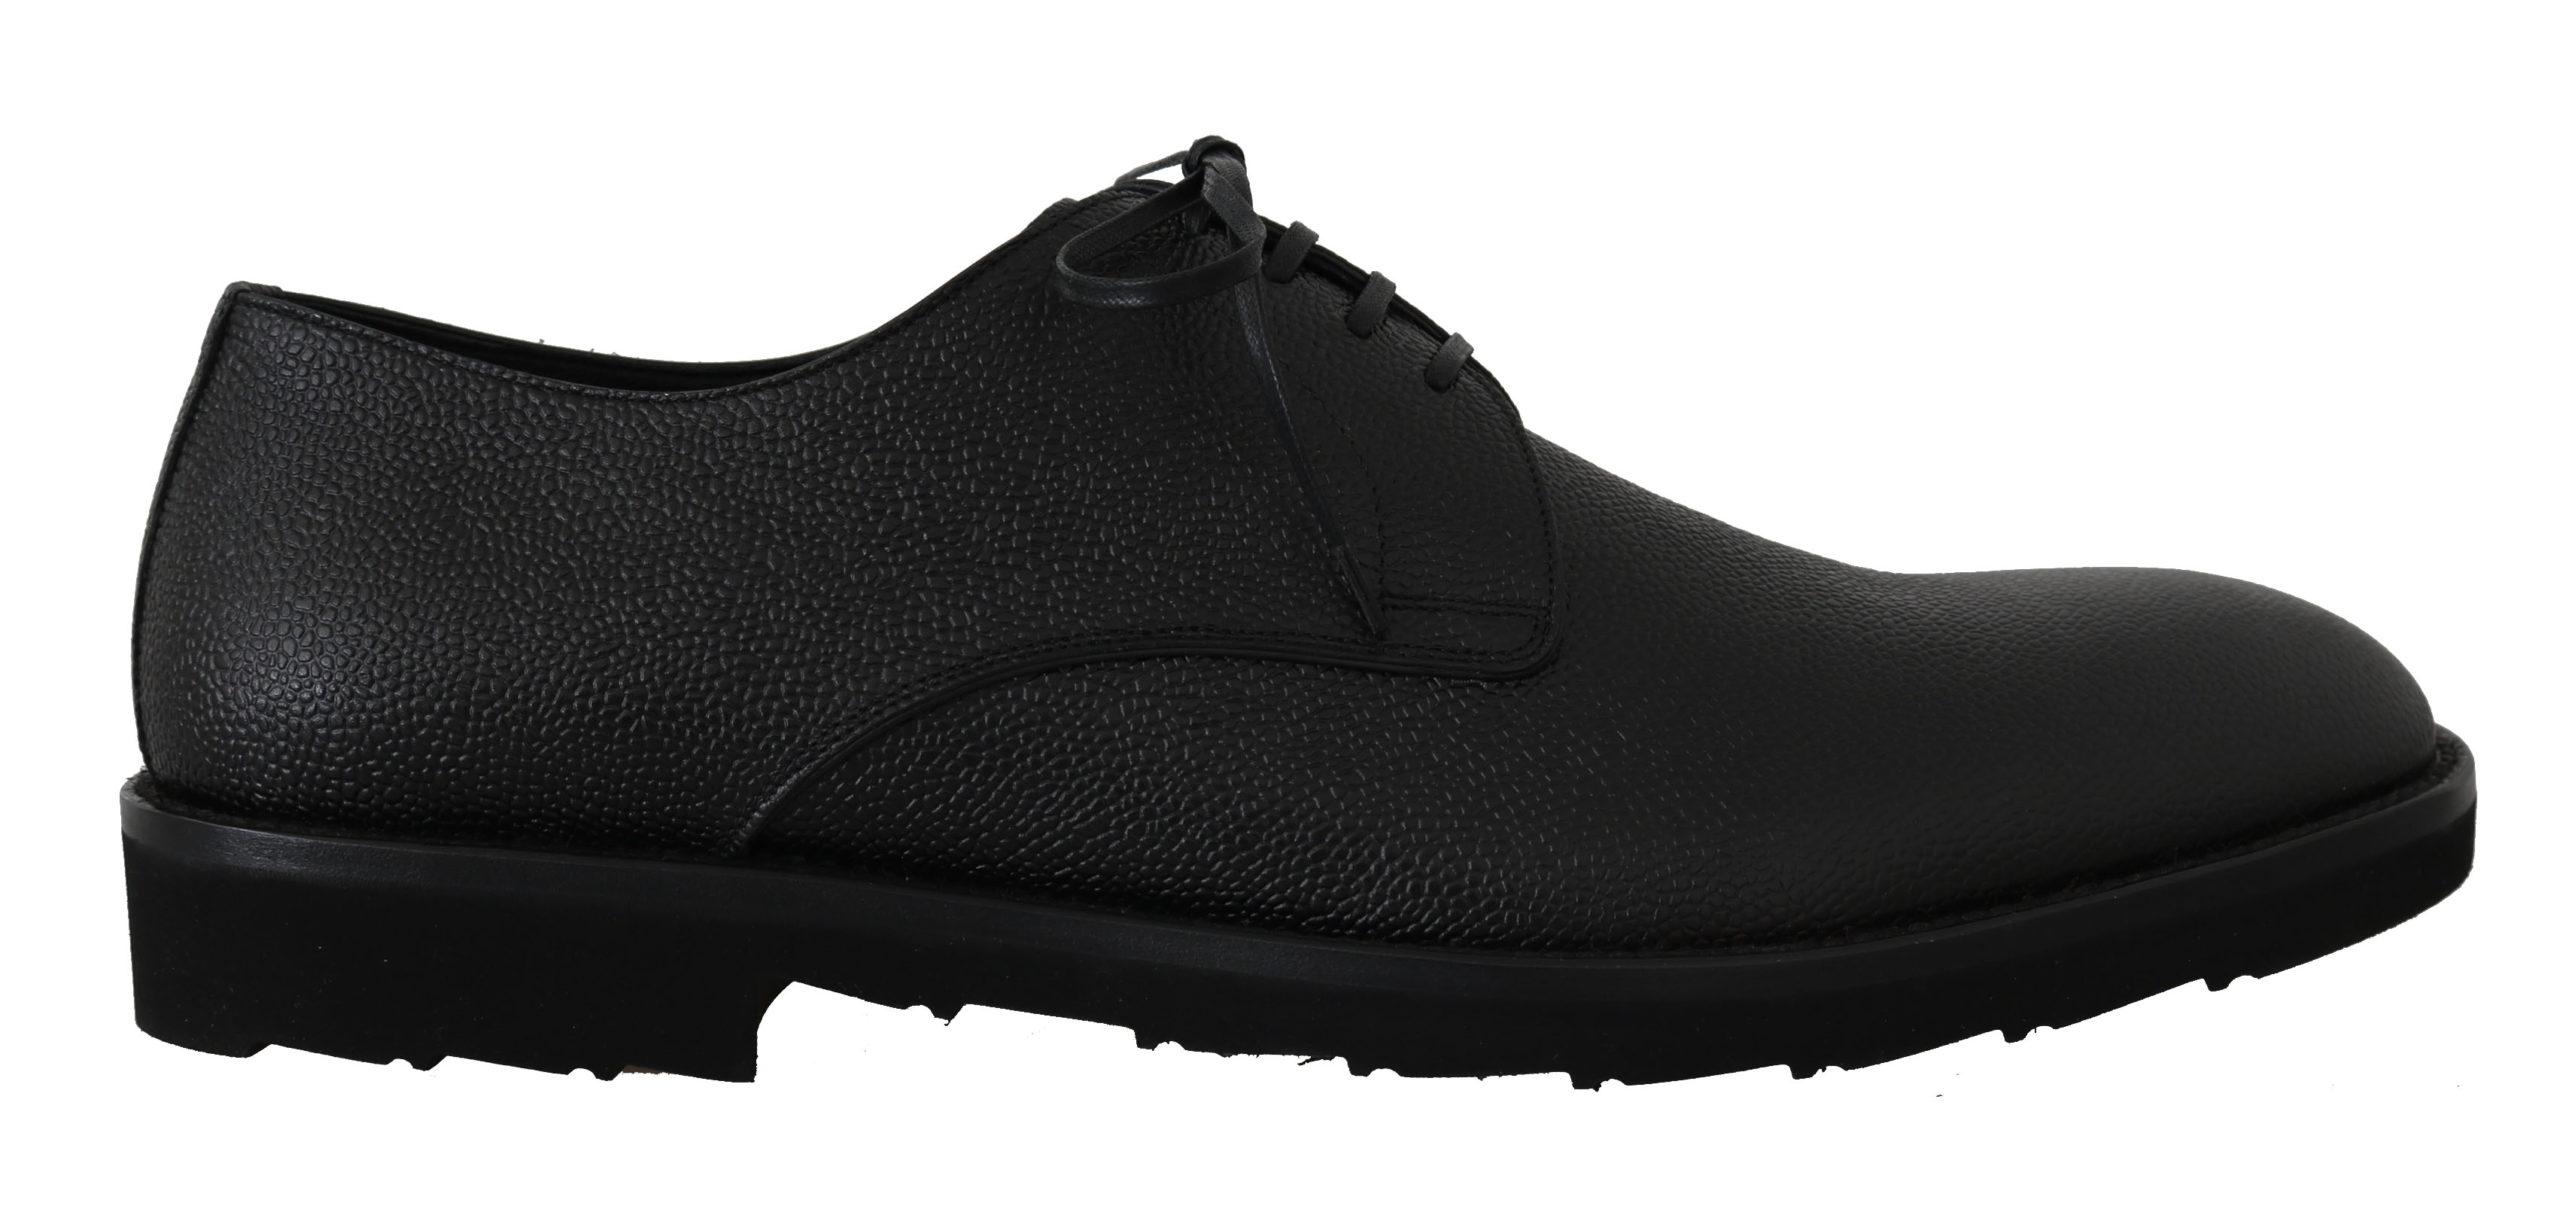 Dolce & Gabbana Men's Leather Derby Dress Formal Shoes Black MV2233 - EU39/US6